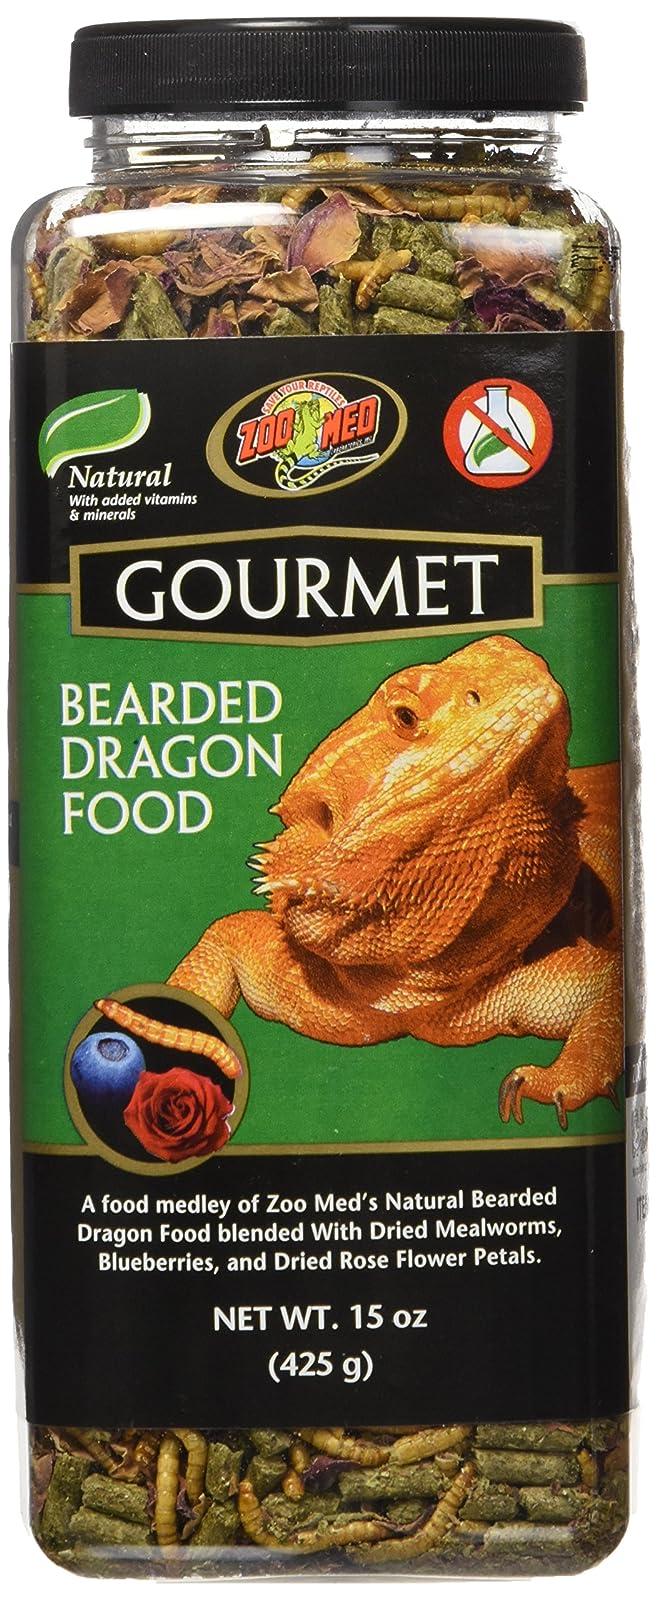 Zoo Med Gourmet Bearded Dragon Food 15 Ounces 5118 REPTURFROG - 1